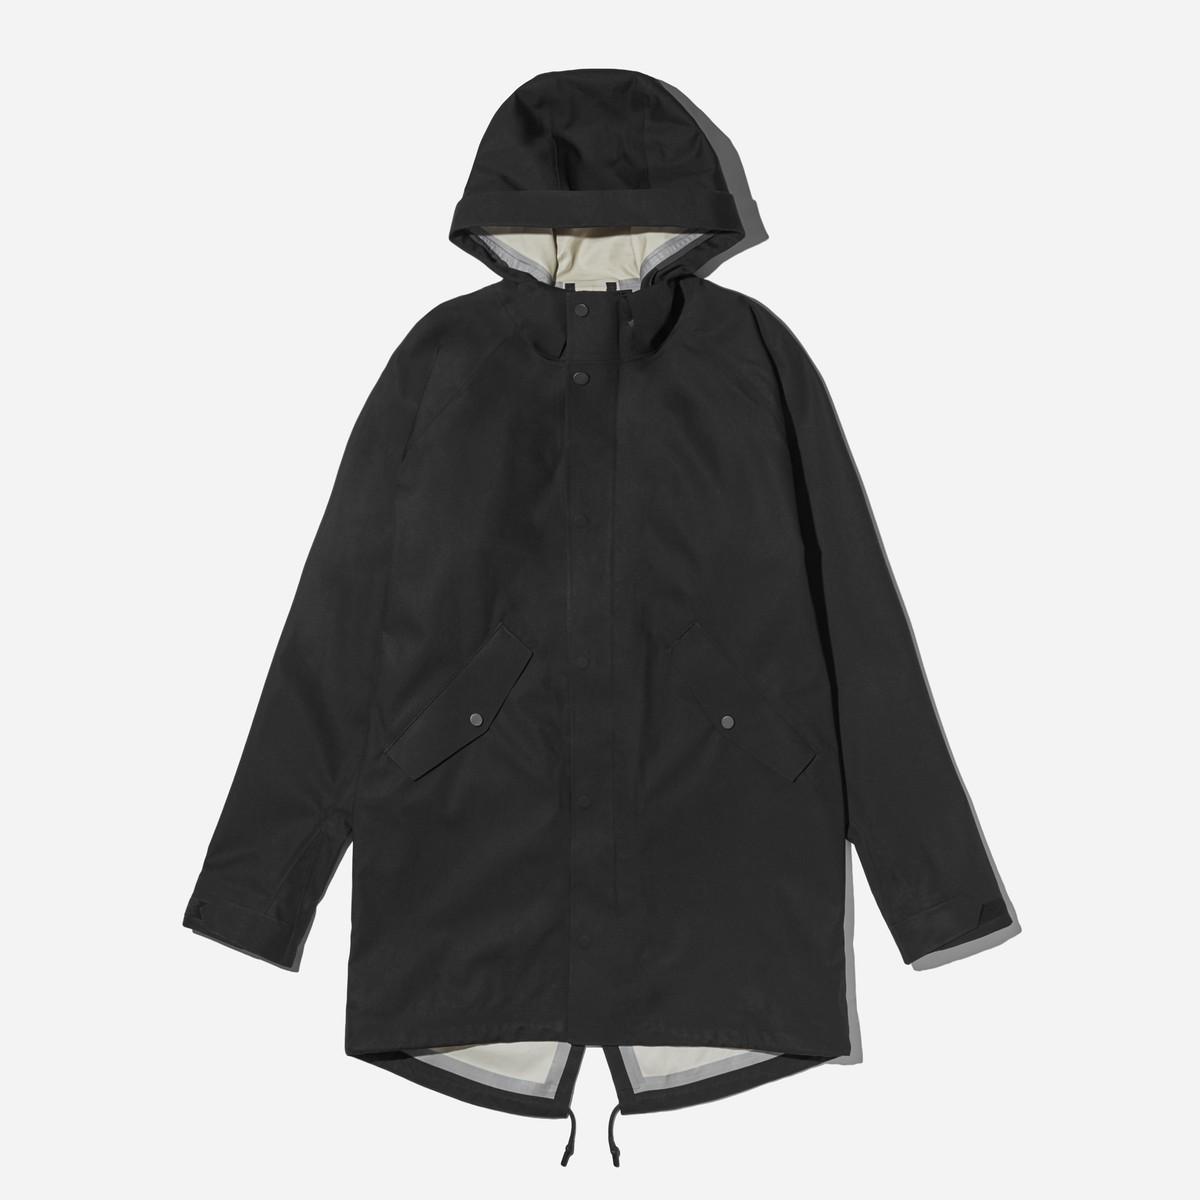 patagonia elements jacket